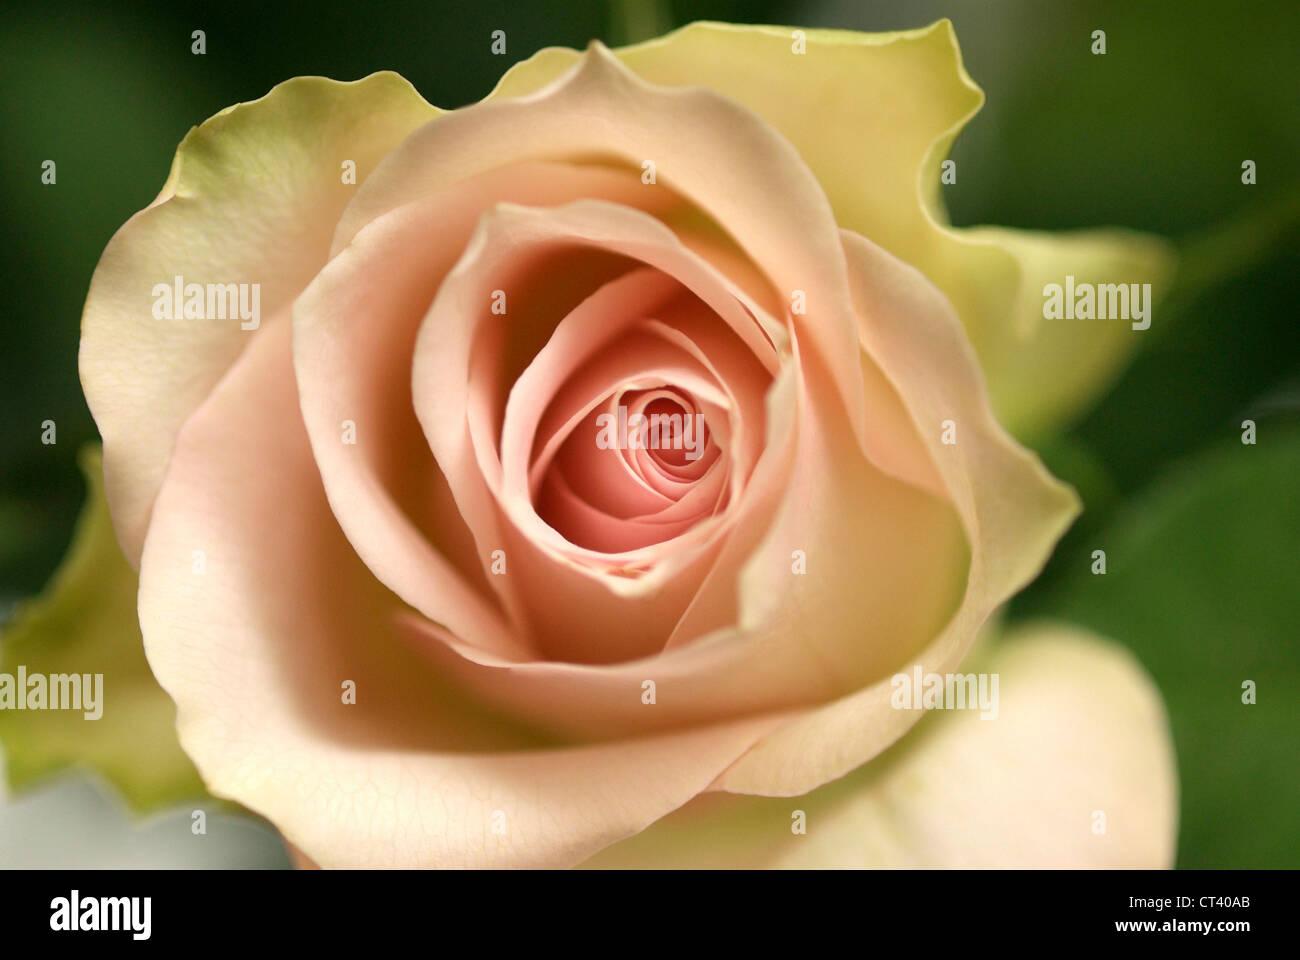 ROSE - Stock Image